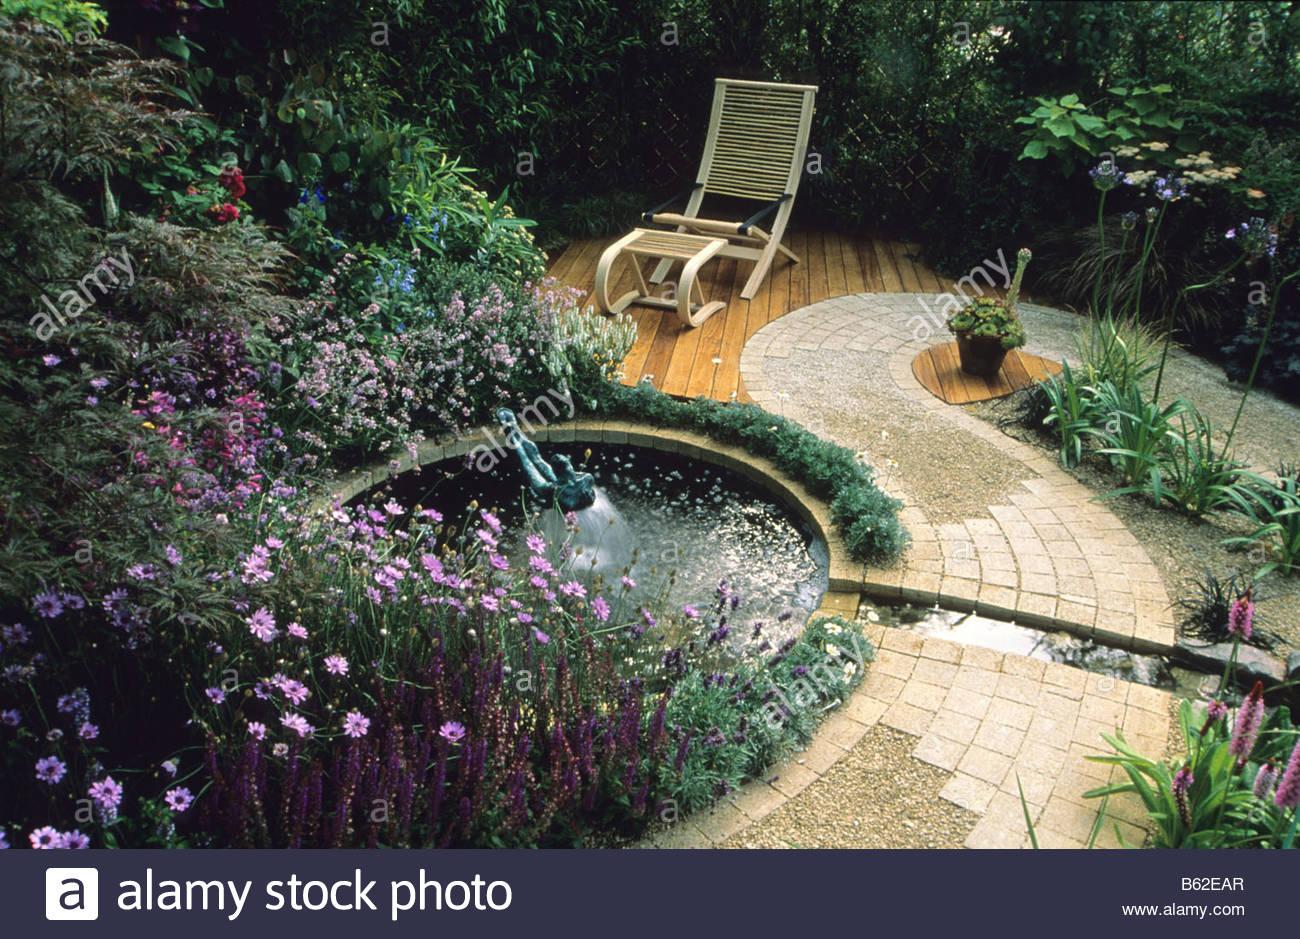 Garden Pathway Ideas Feng Shui Garden Design Pamela Woods Circular Pool With